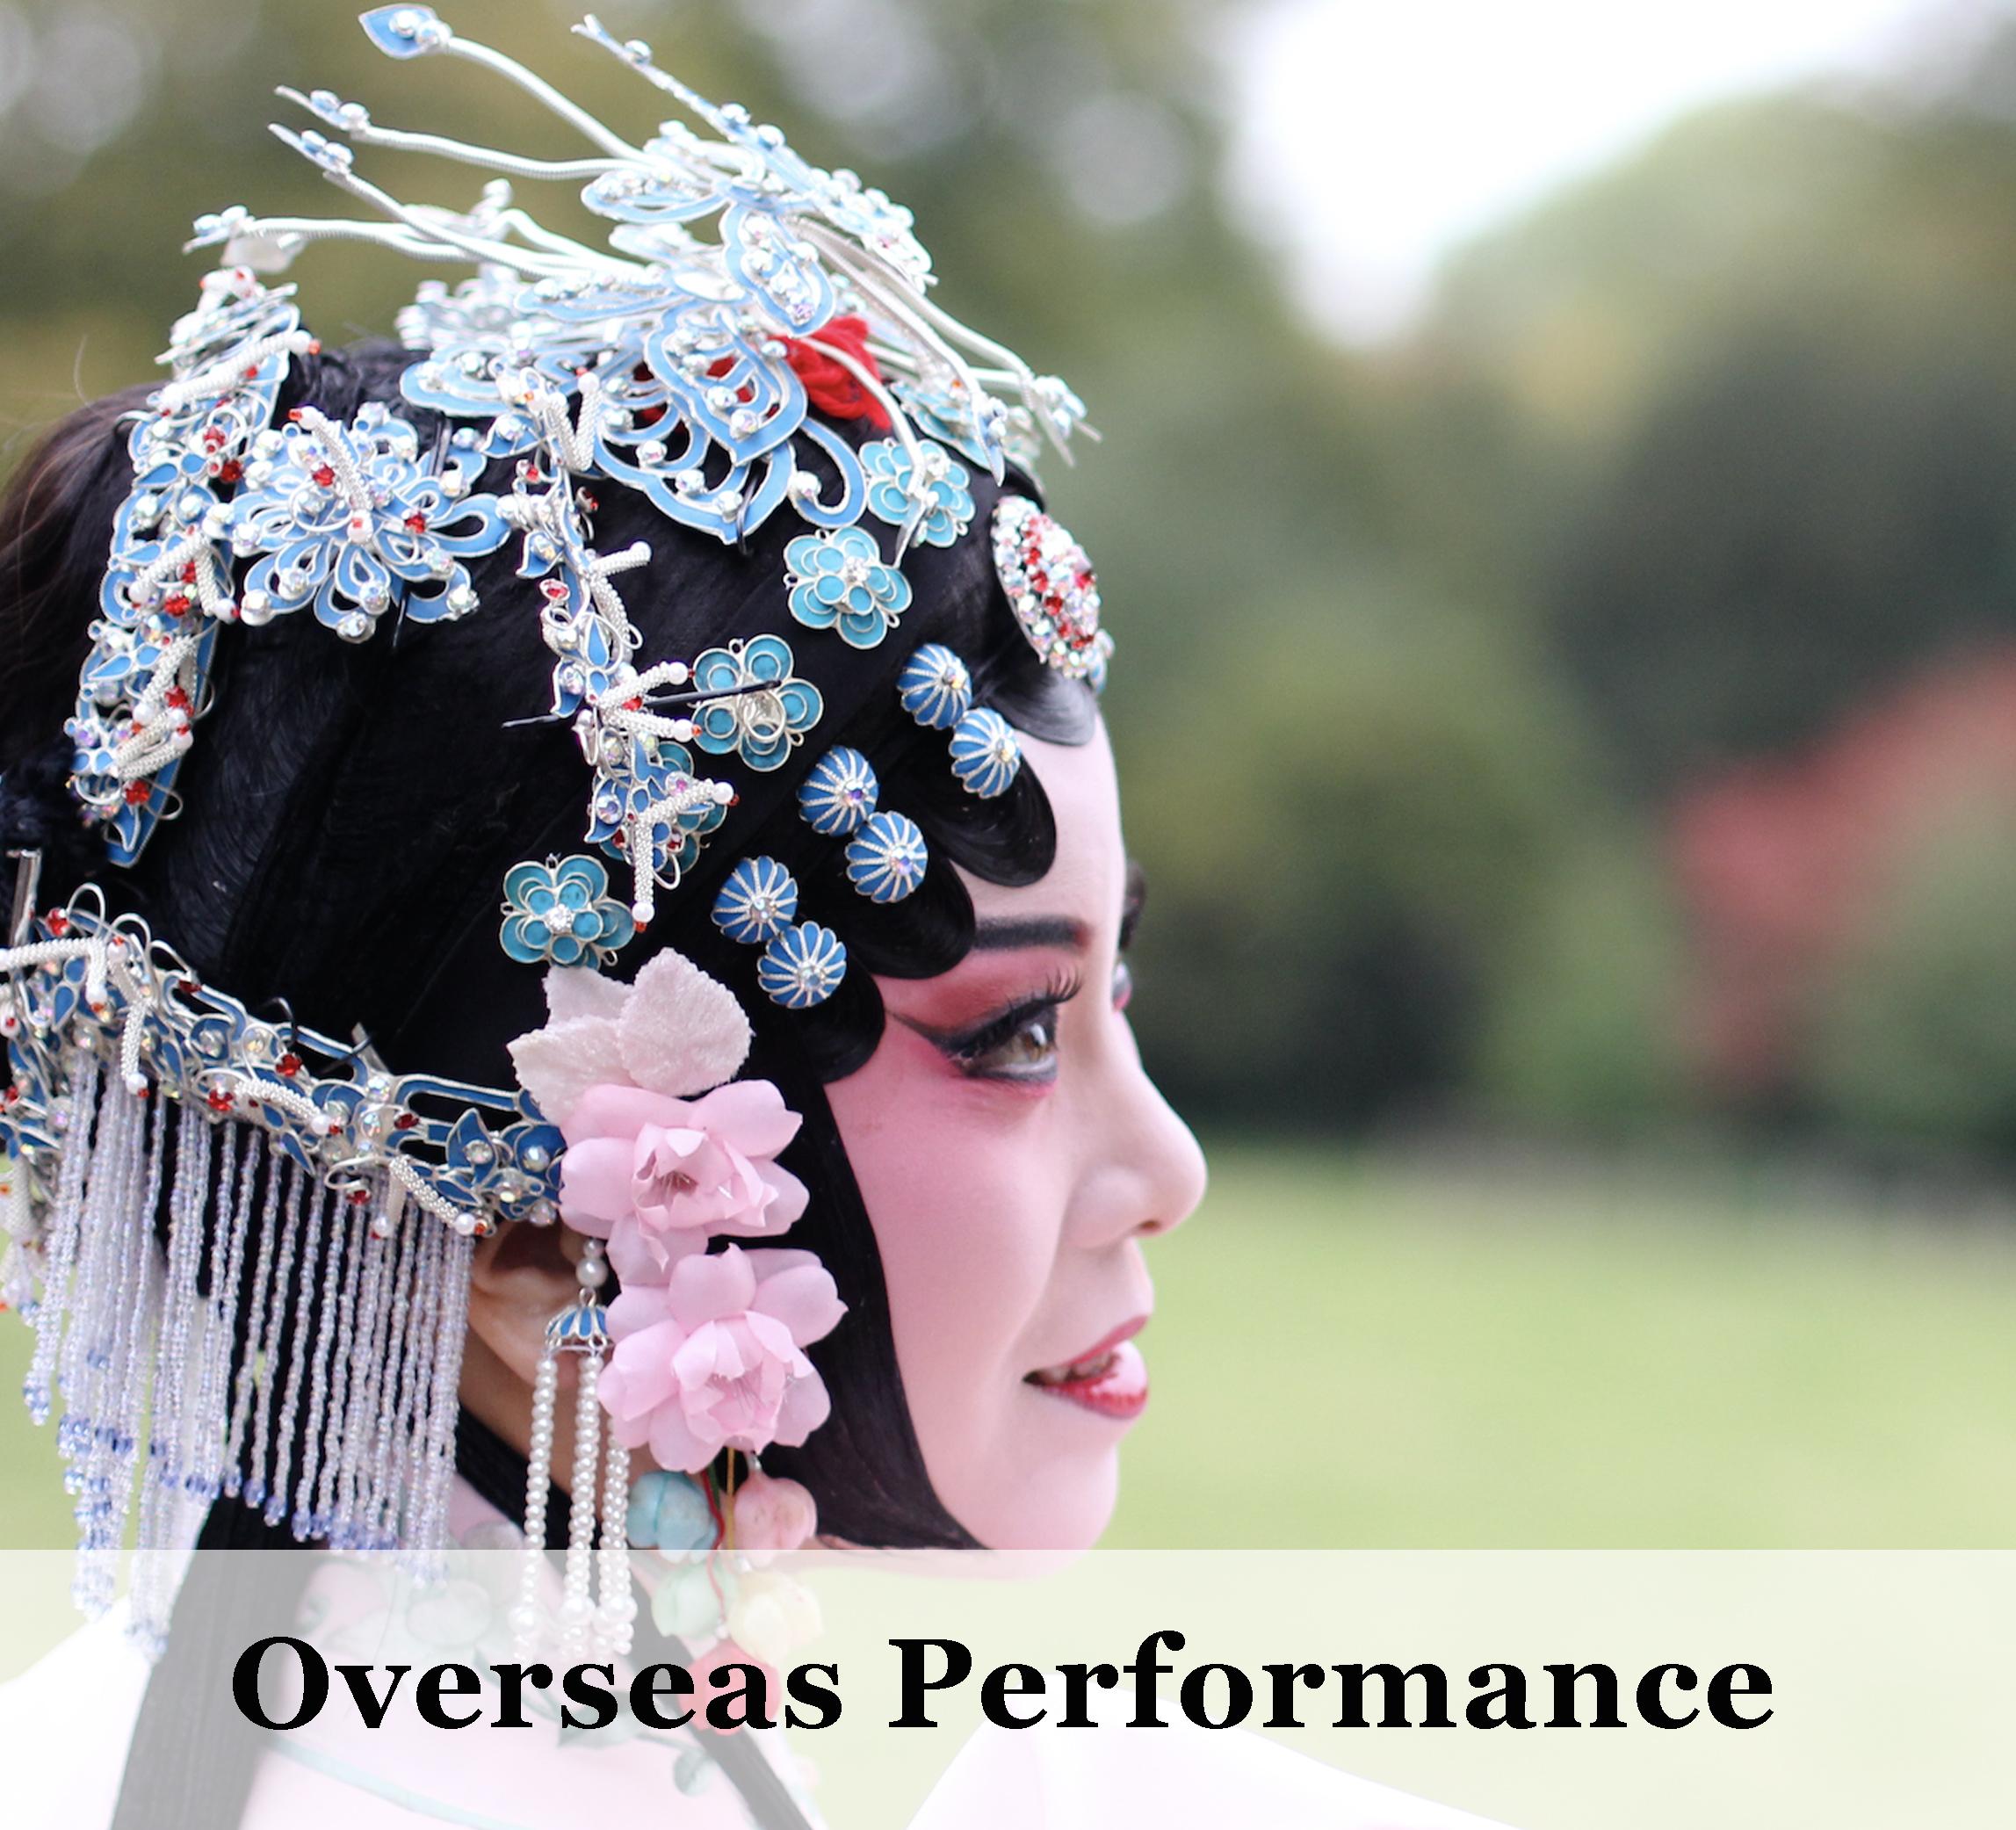 Overseas Performance .jpg